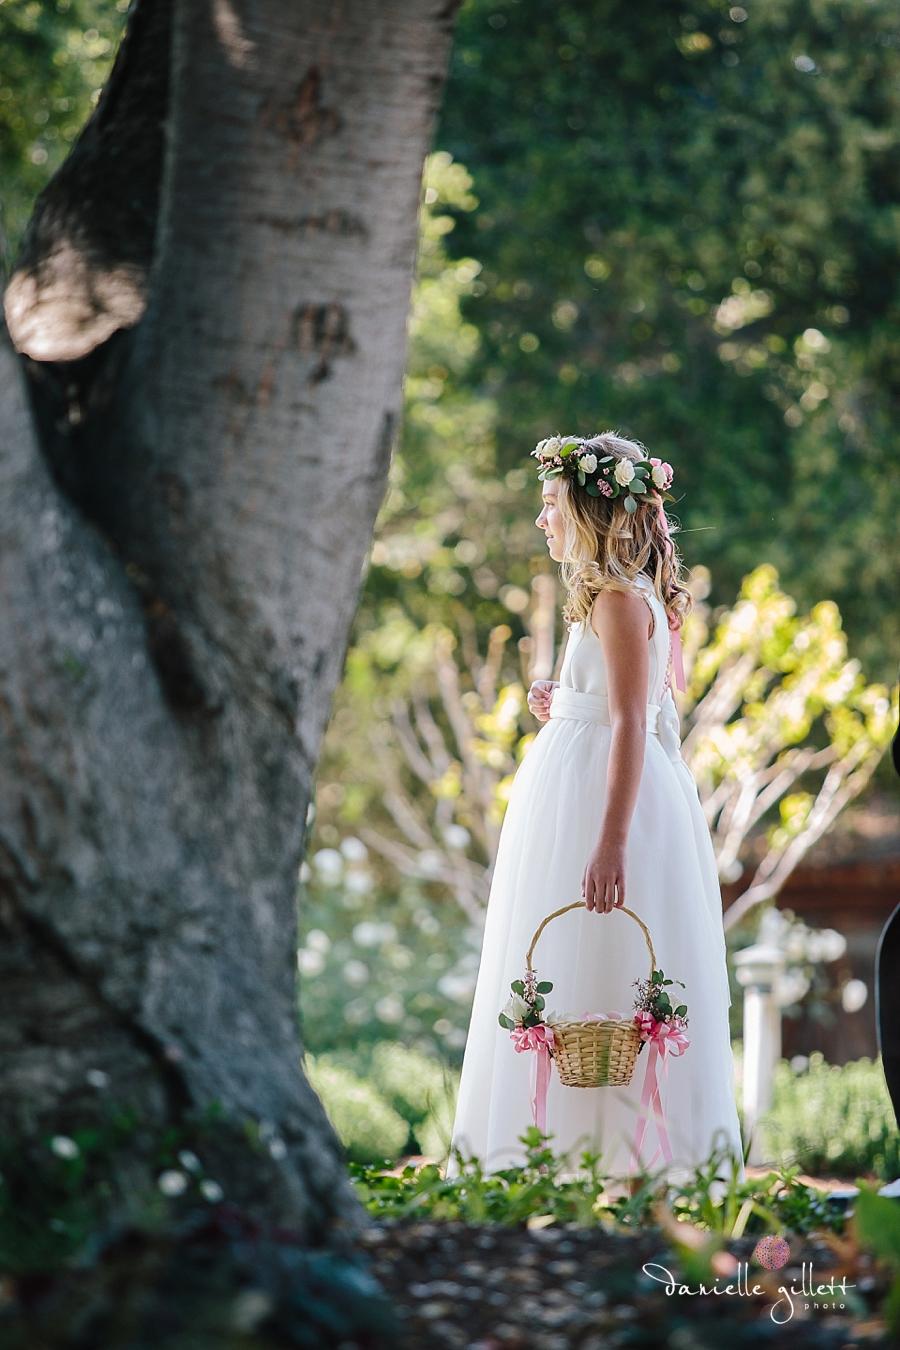 Holman Ranch Wedding Photography. Wedding photography in Carmel Valley. Outdoor wedding photography. Hacienda Wedding. flower girl photos